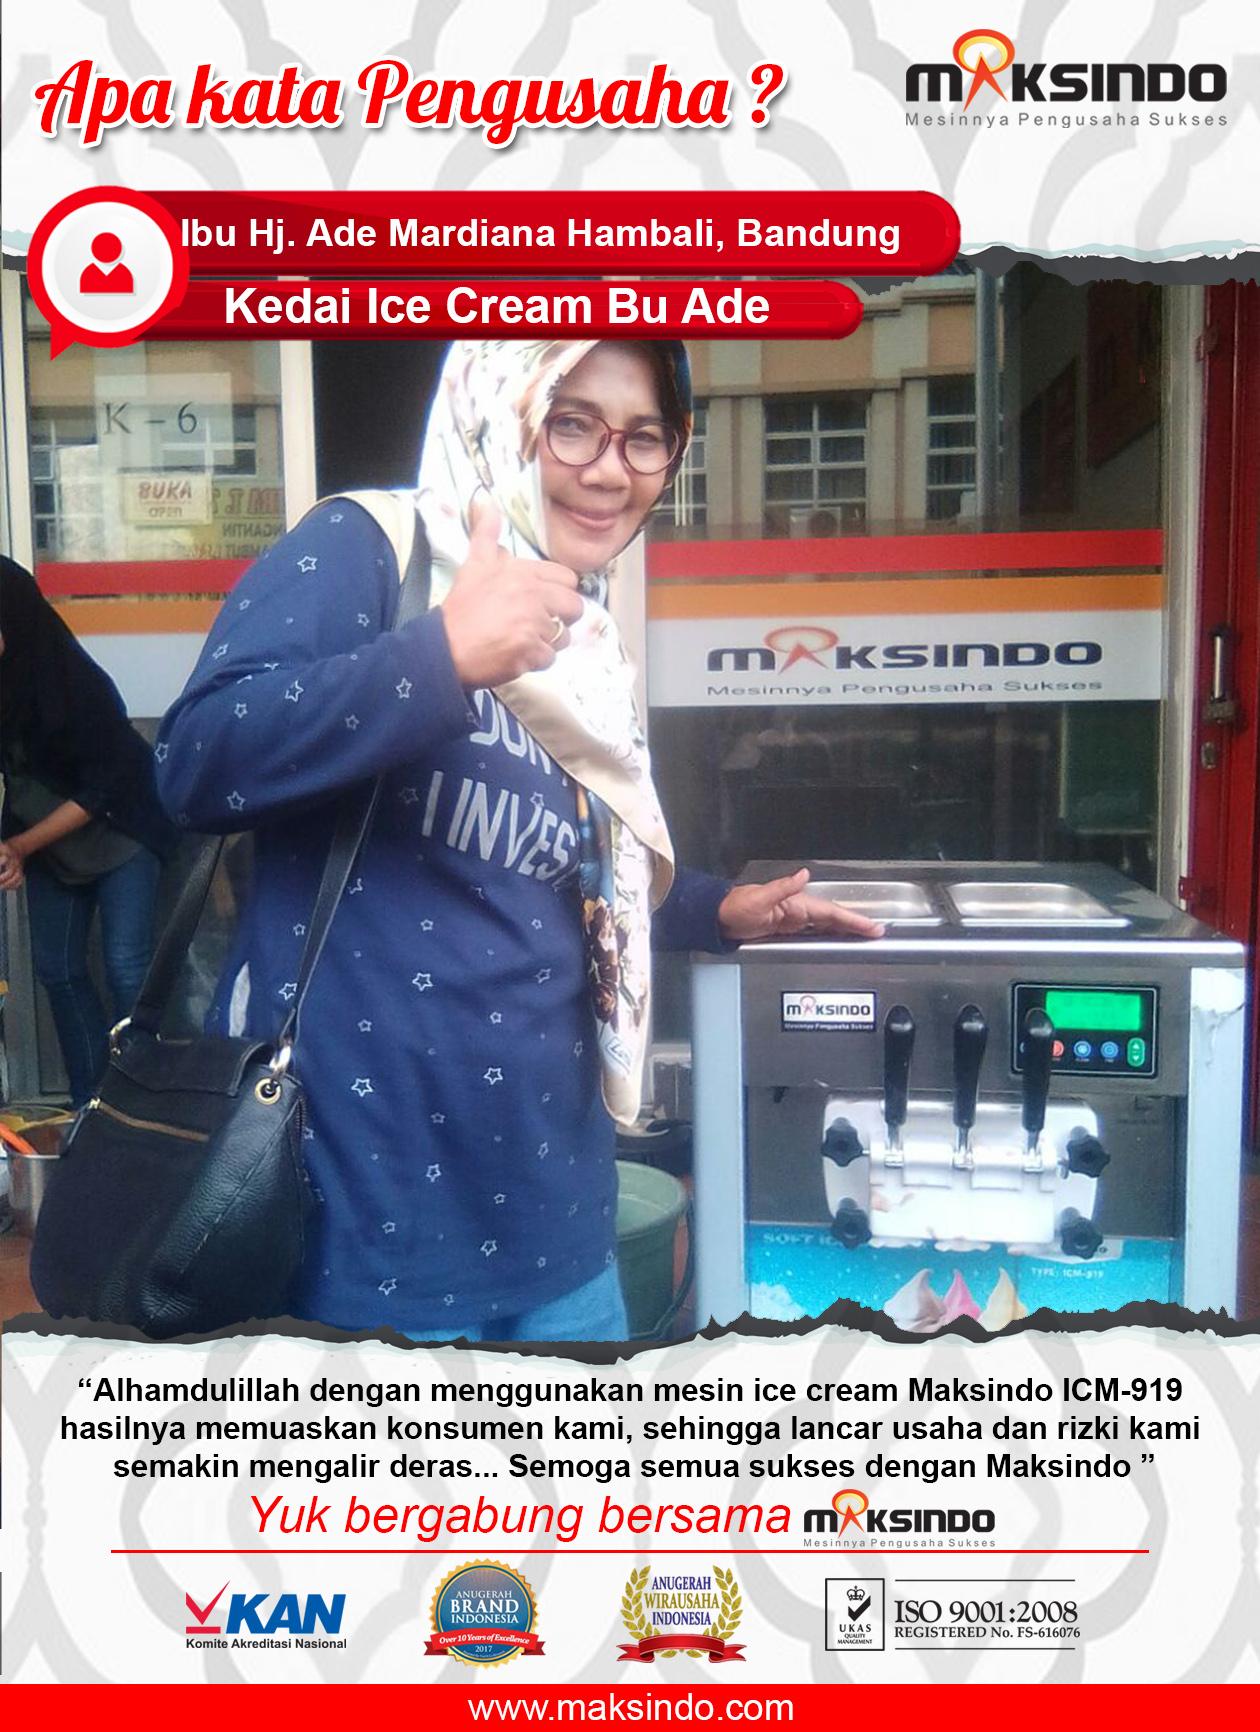 Kedai Ice Cream Bu Ade : Bisnis Ice Cream Makin Lancar Dengan Mesin Ice Cream Maksindo